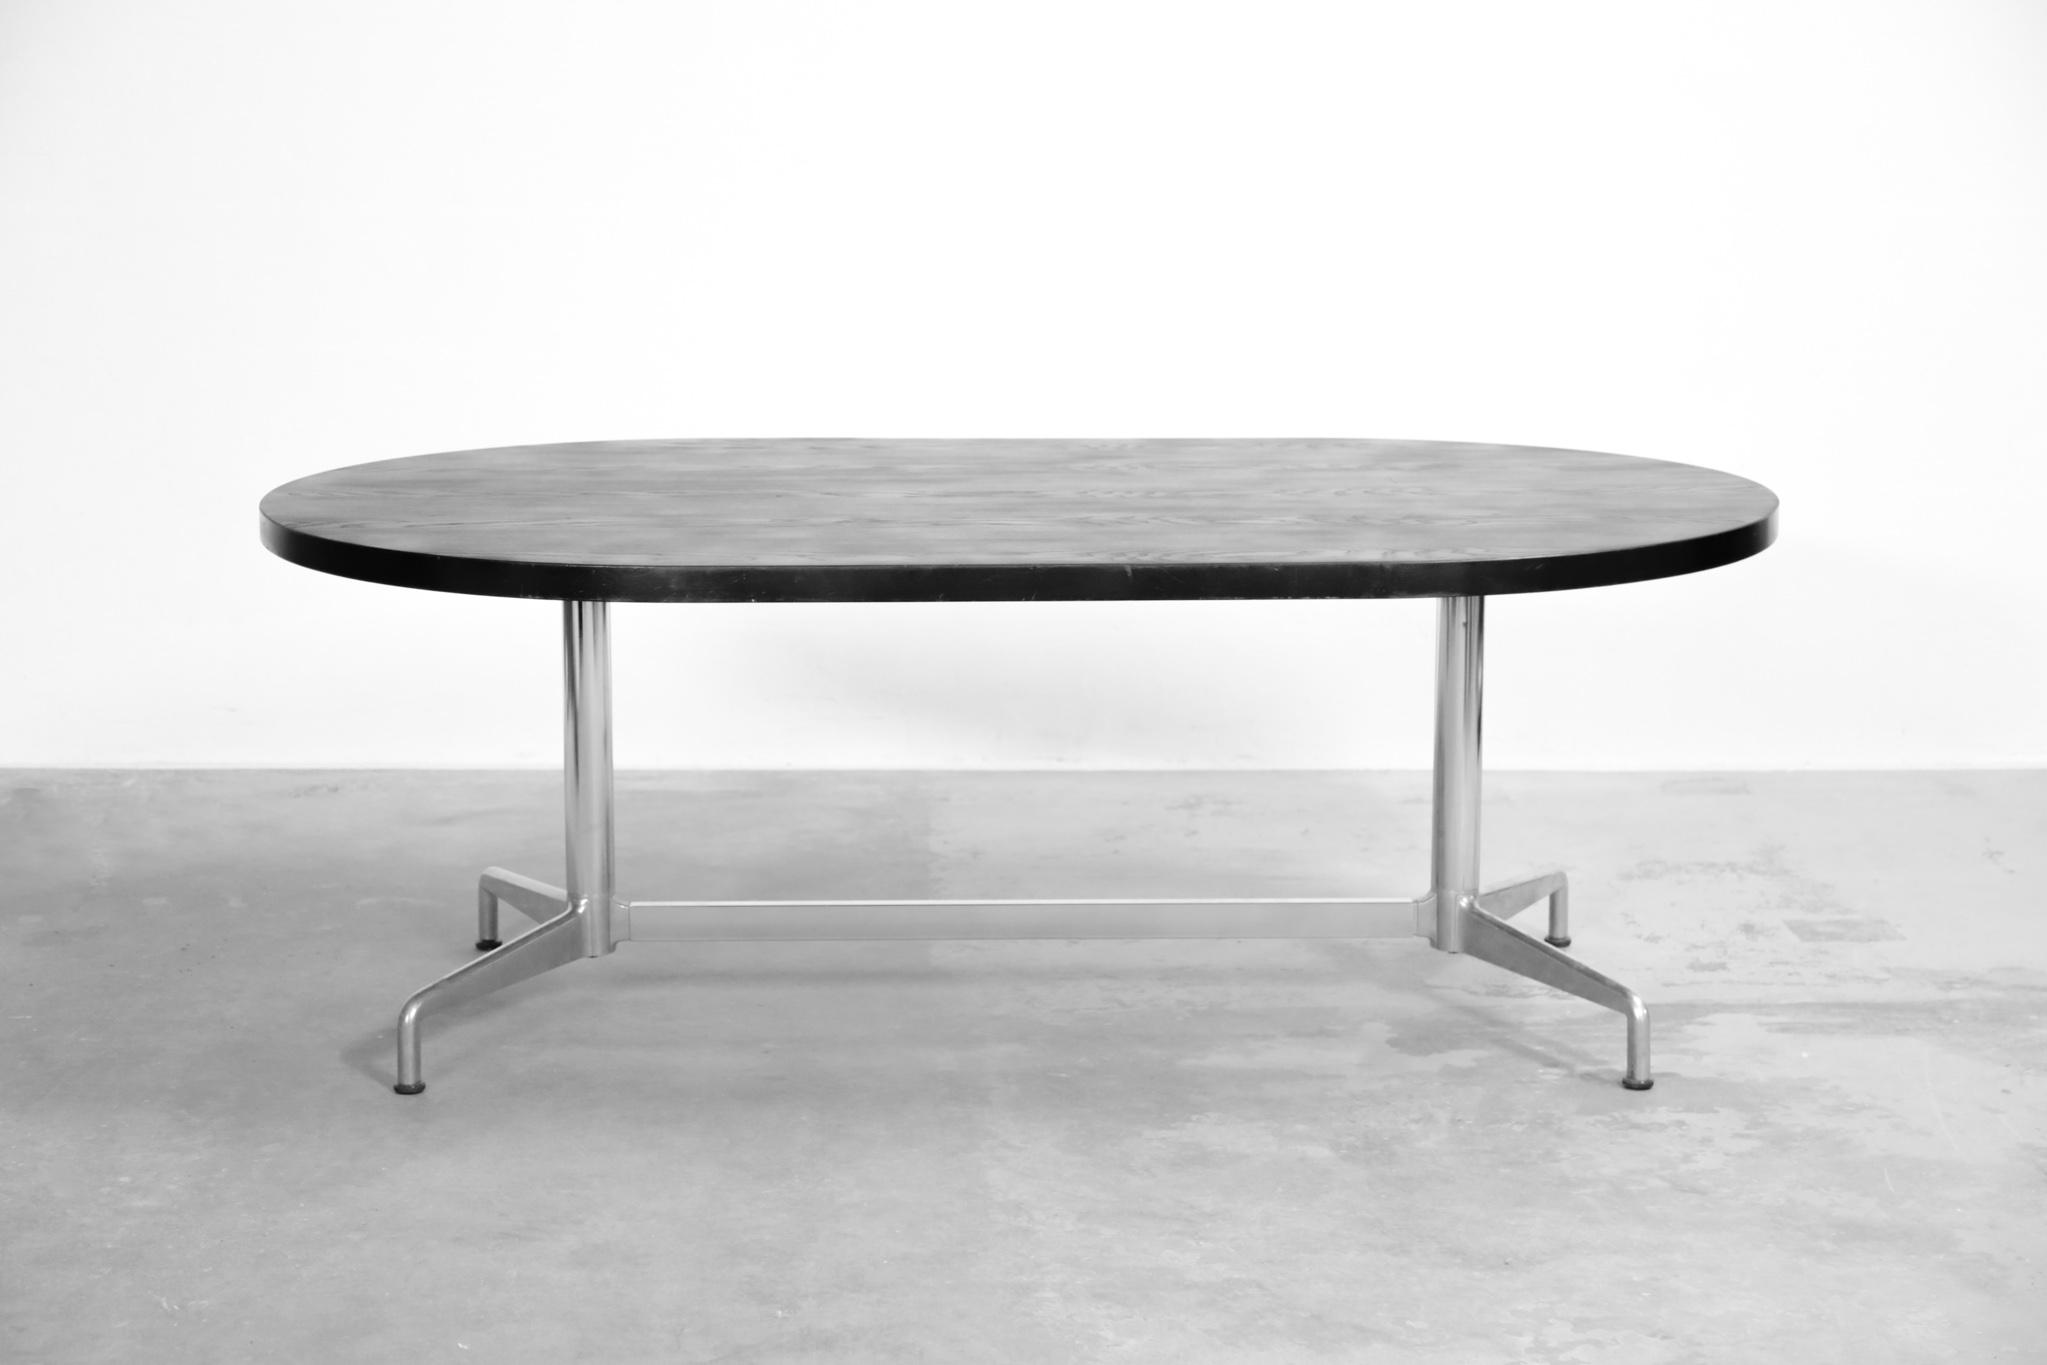 grande table manger giancarlo piretti vintage italienne danke galerie. Black Bedroom Furniture Sets. Home Design Ideas